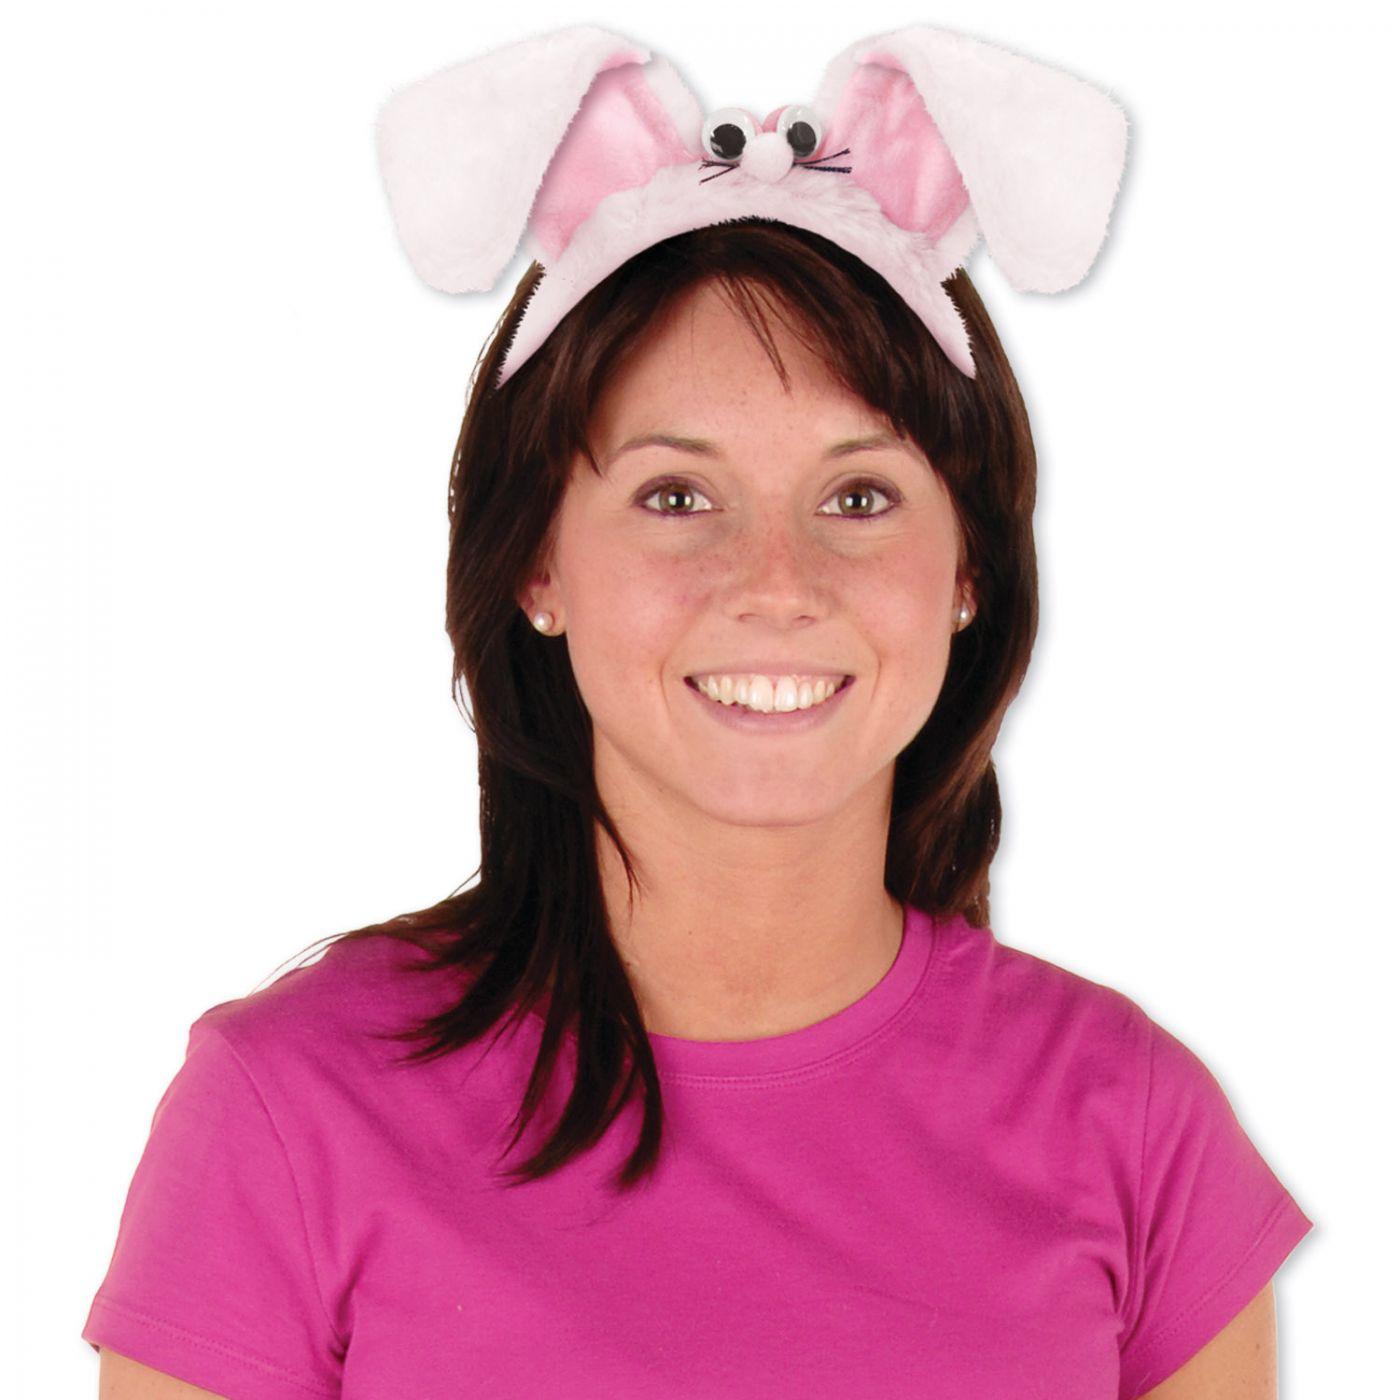 Plush Bunny Ears Headband image